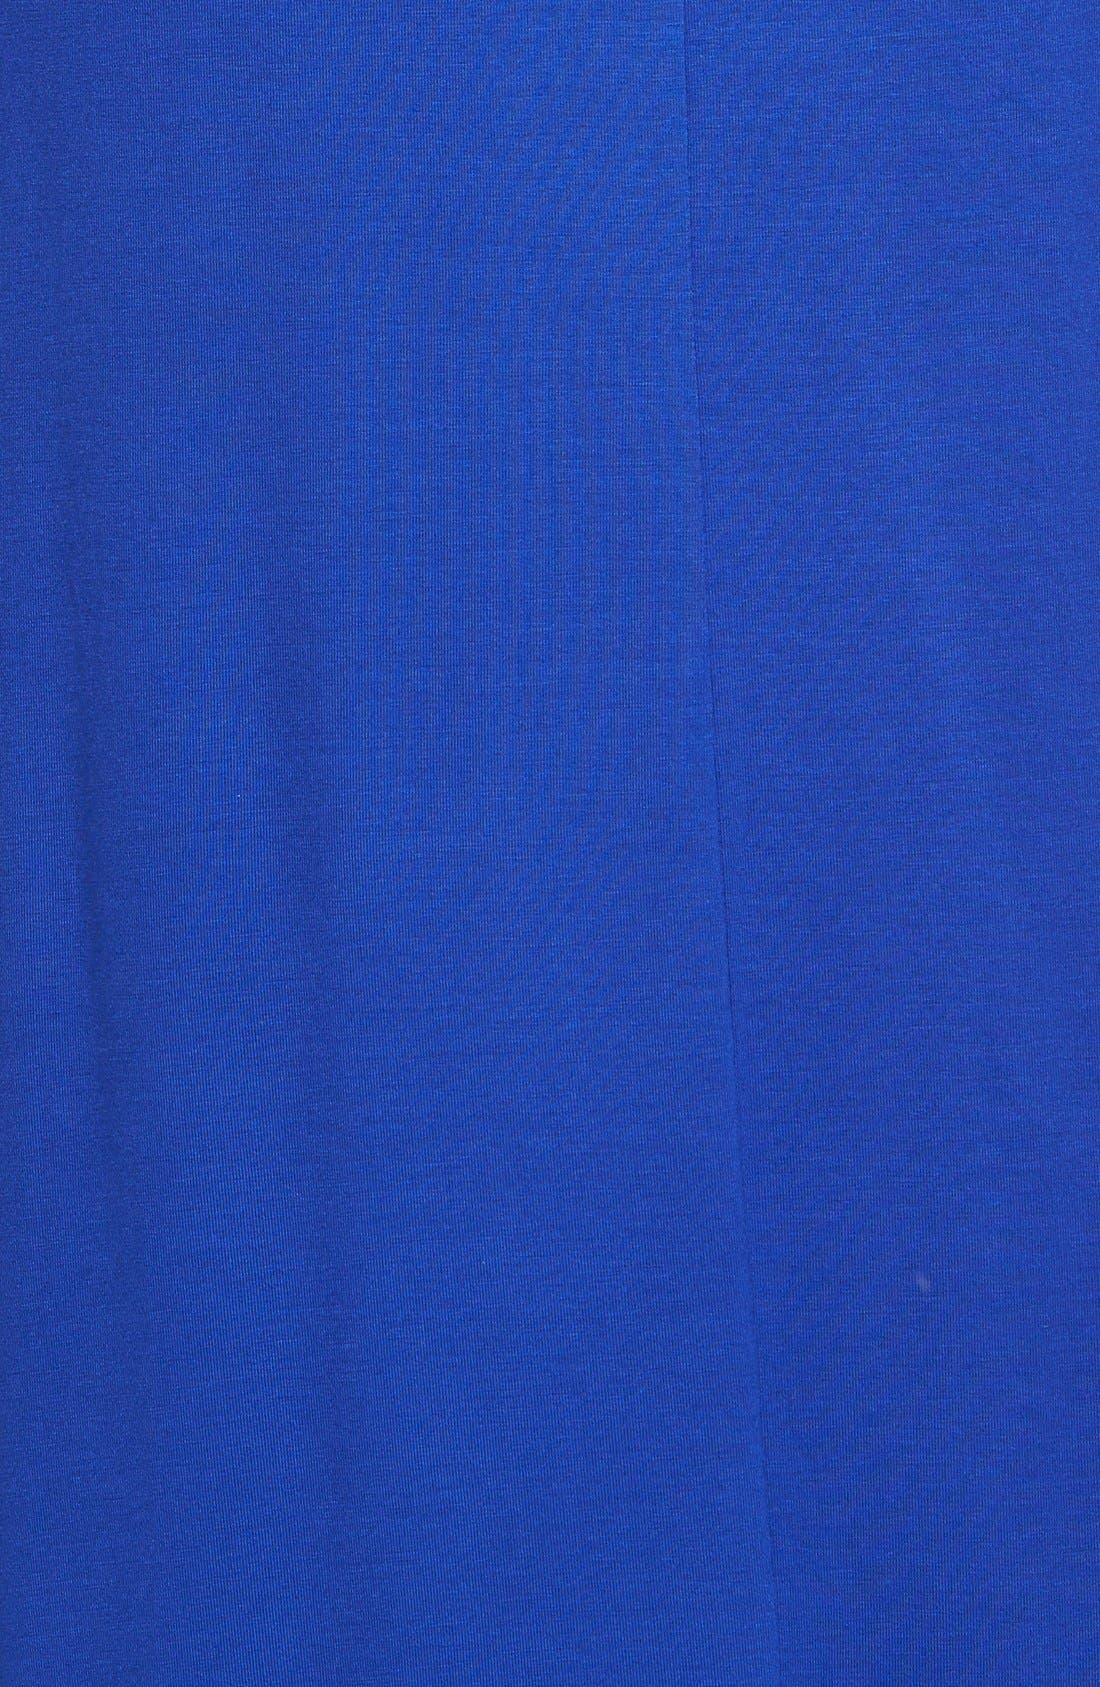 V-Neck Jersey Maxi Dress,                             Alternate thumbnail 2, color,                             Blue Mazarine